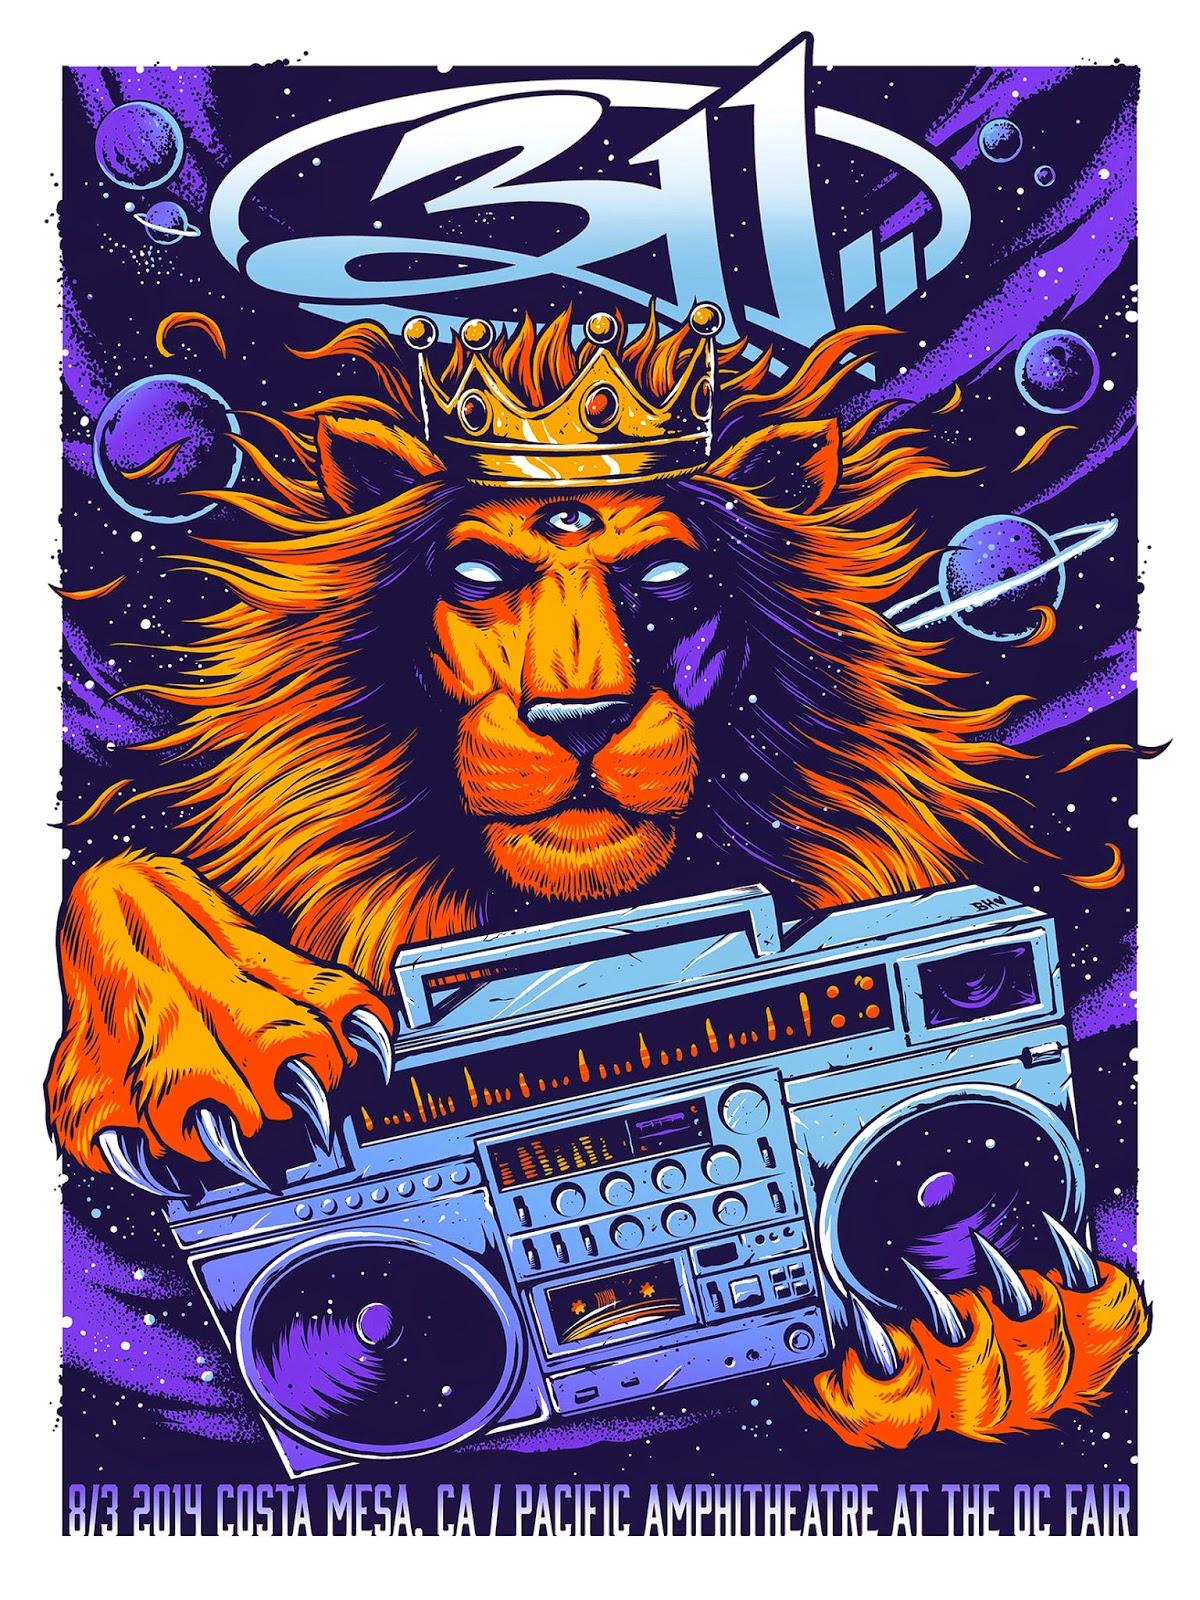 INSIDE THE ROCK POSTER FRAME BLOG: 311 Costa Mesa Poster by Brandon ...